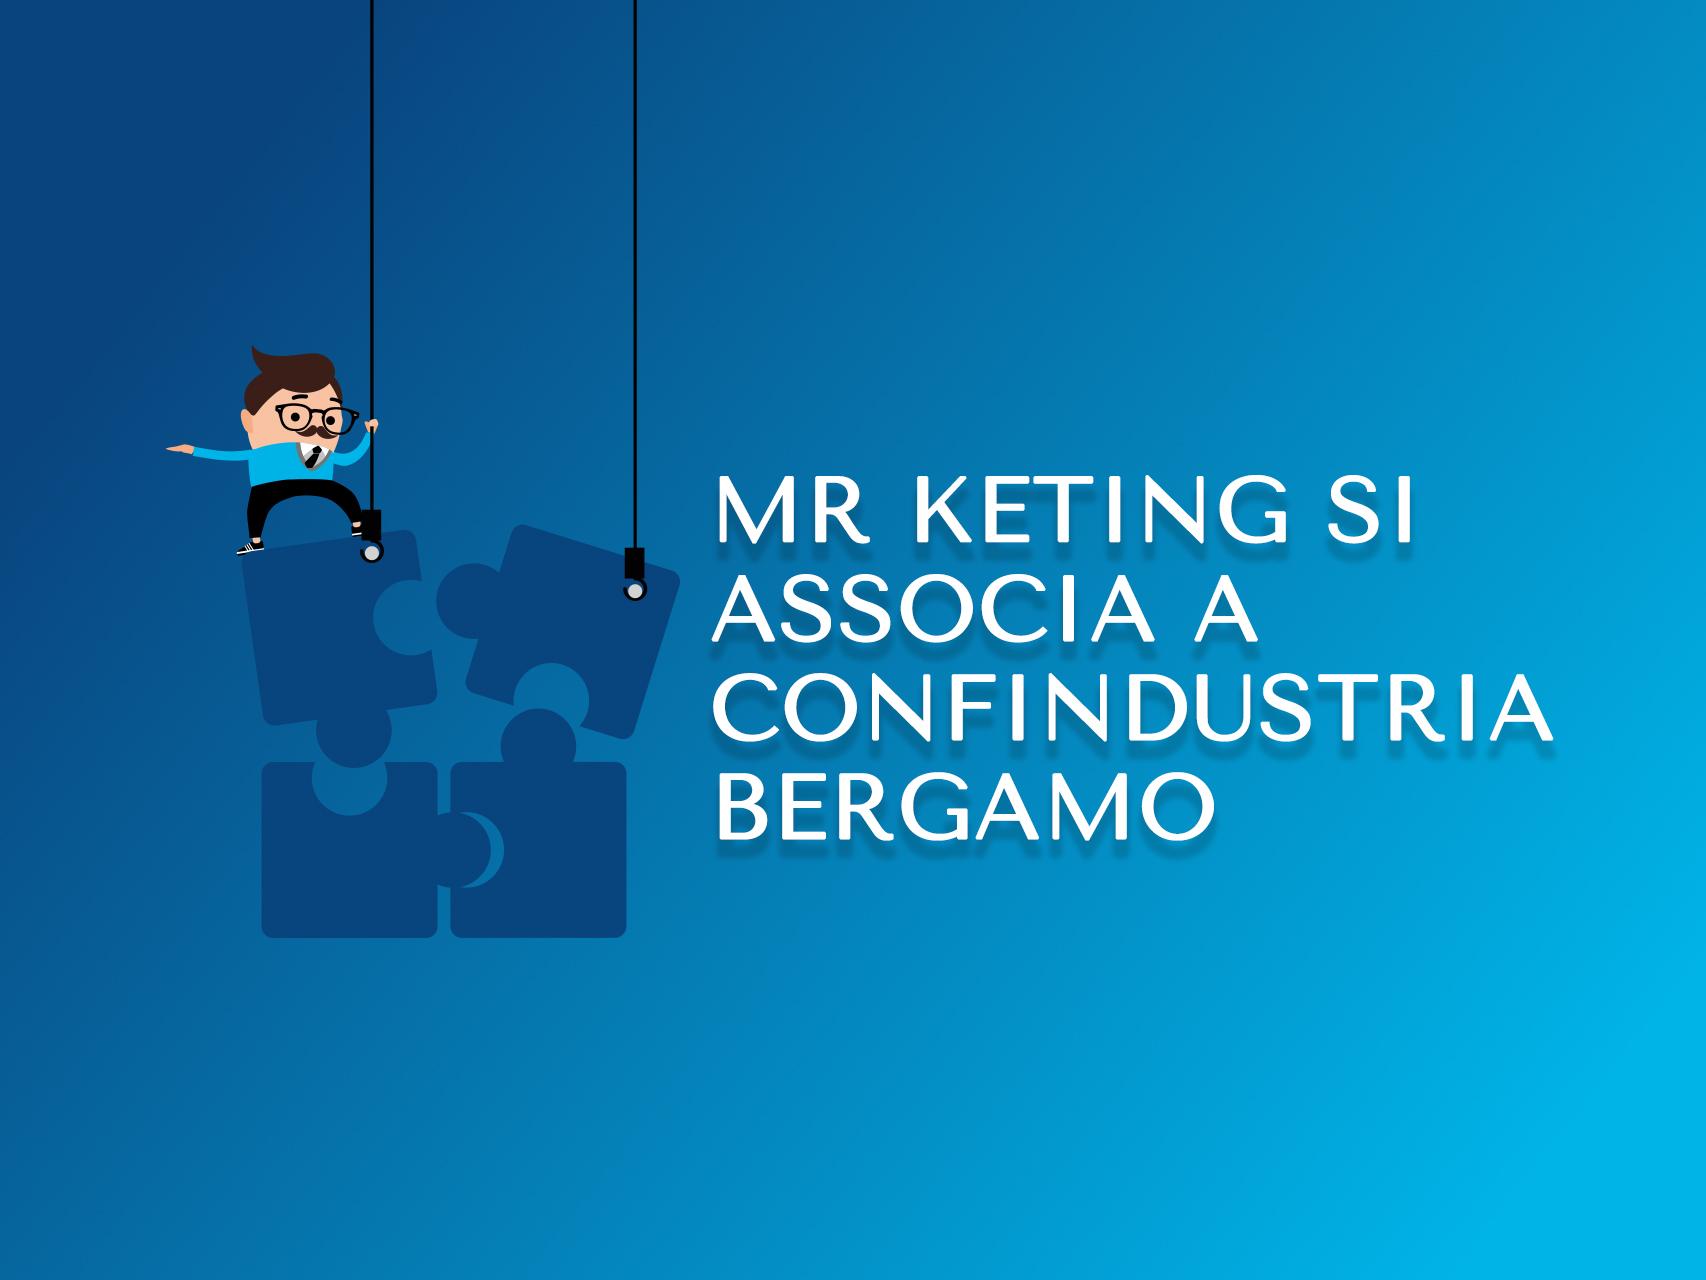 Mr Keting Confindustria Bergamo